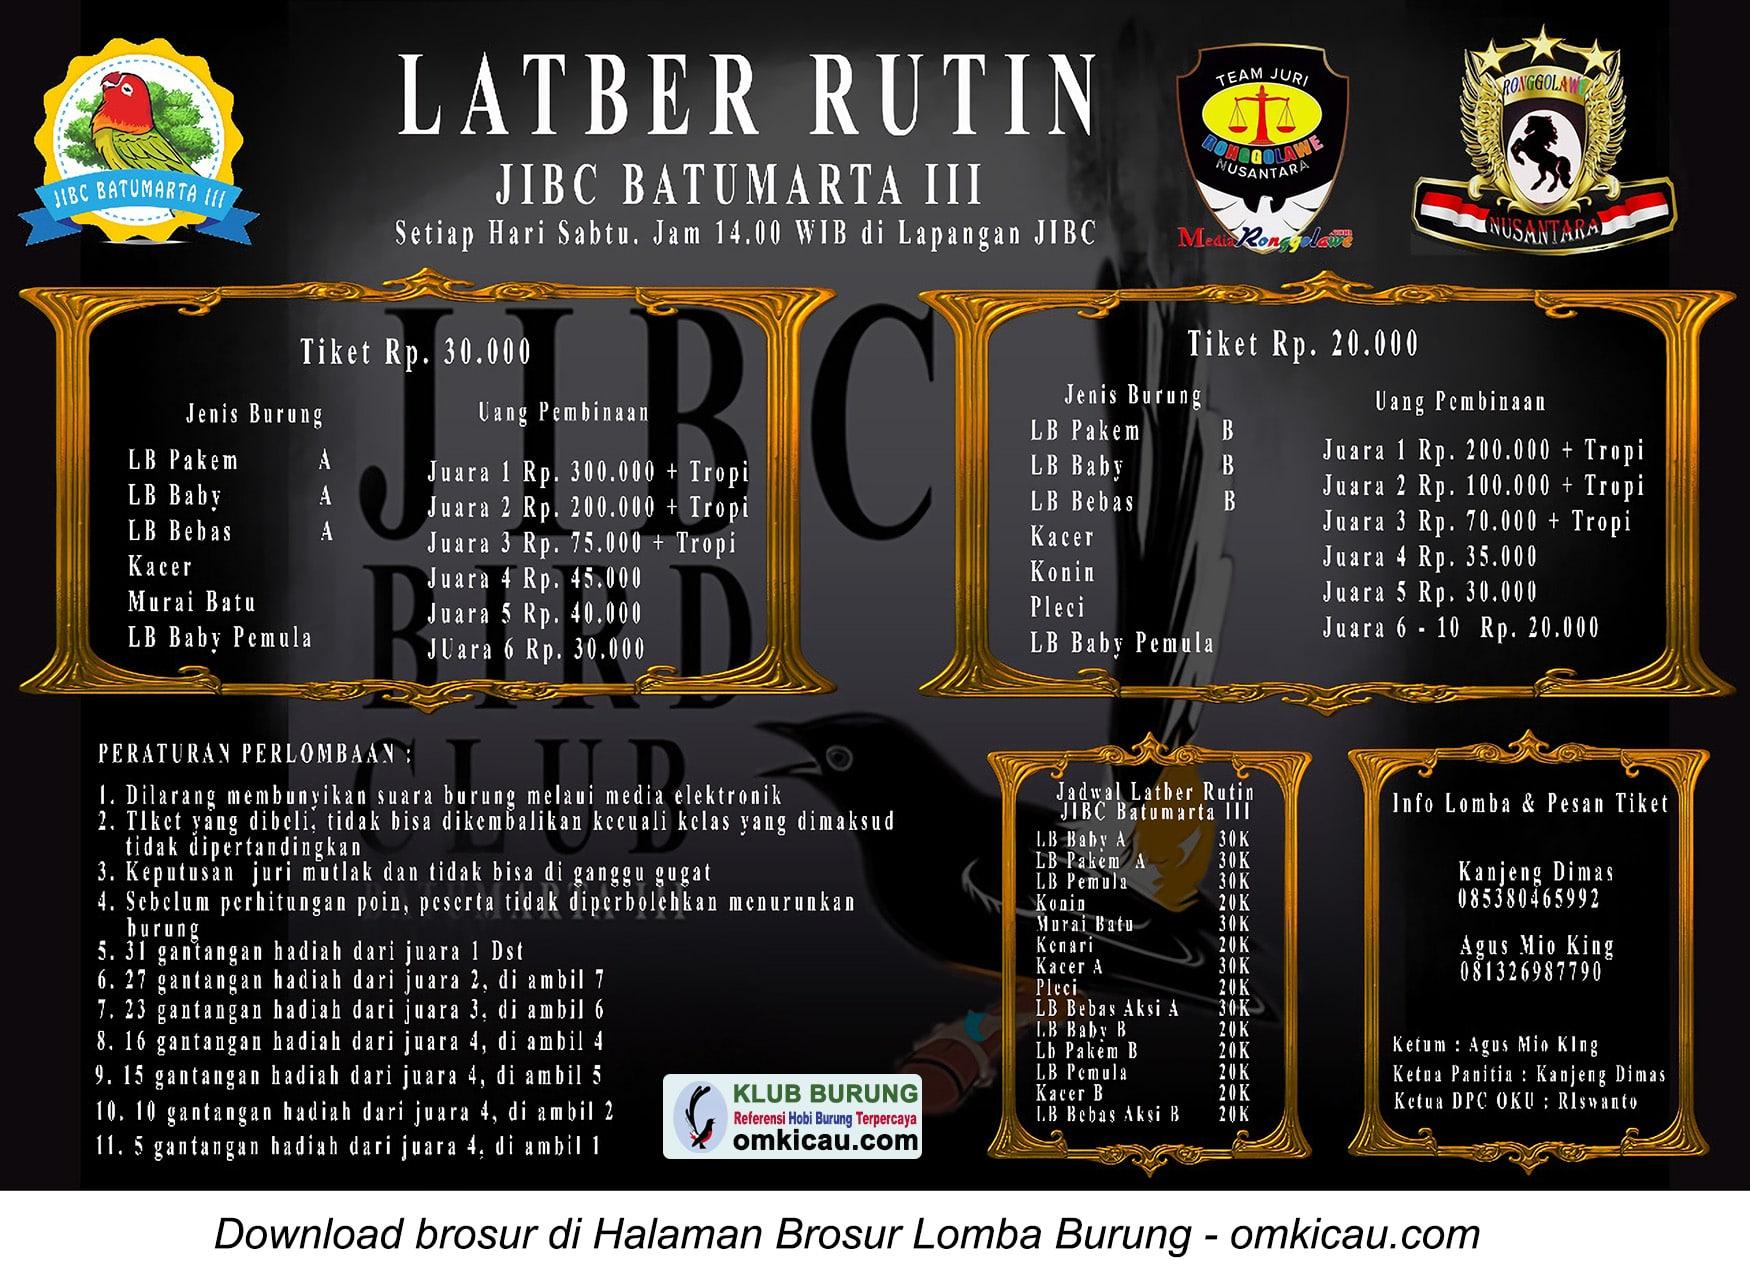 Latber Rutin JIBC Batumarta III